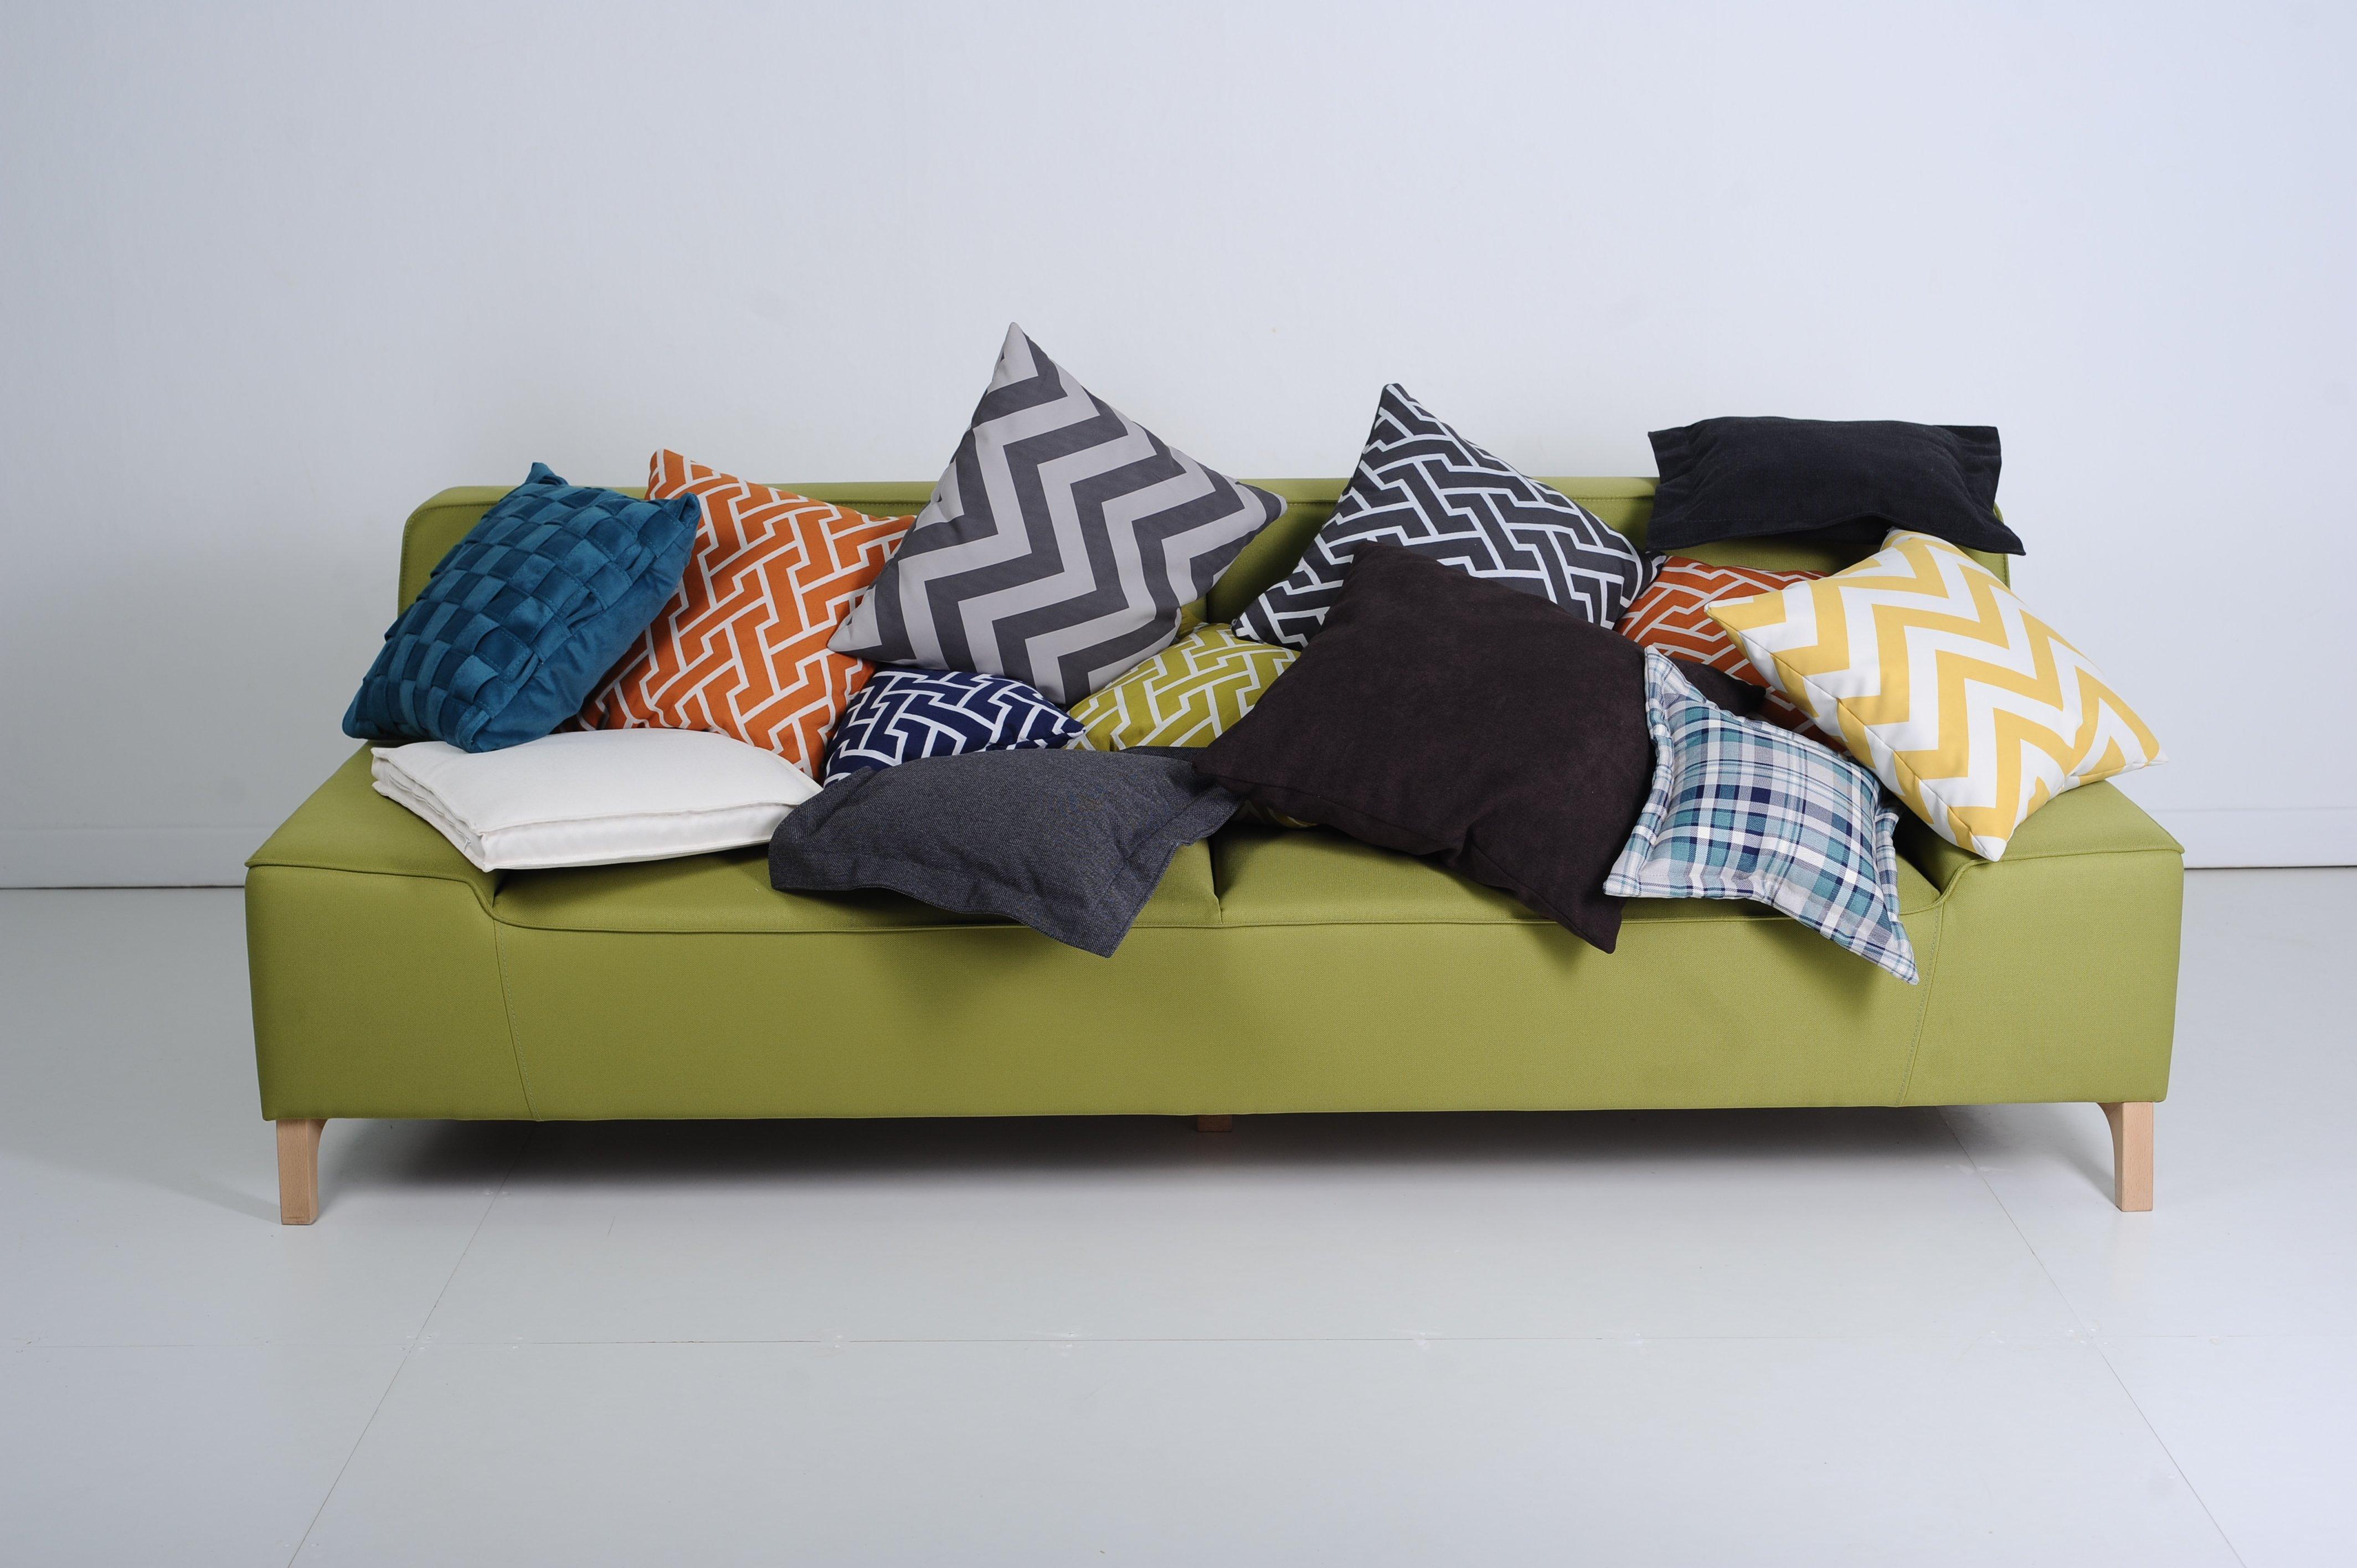 подушки для мягкой мебели